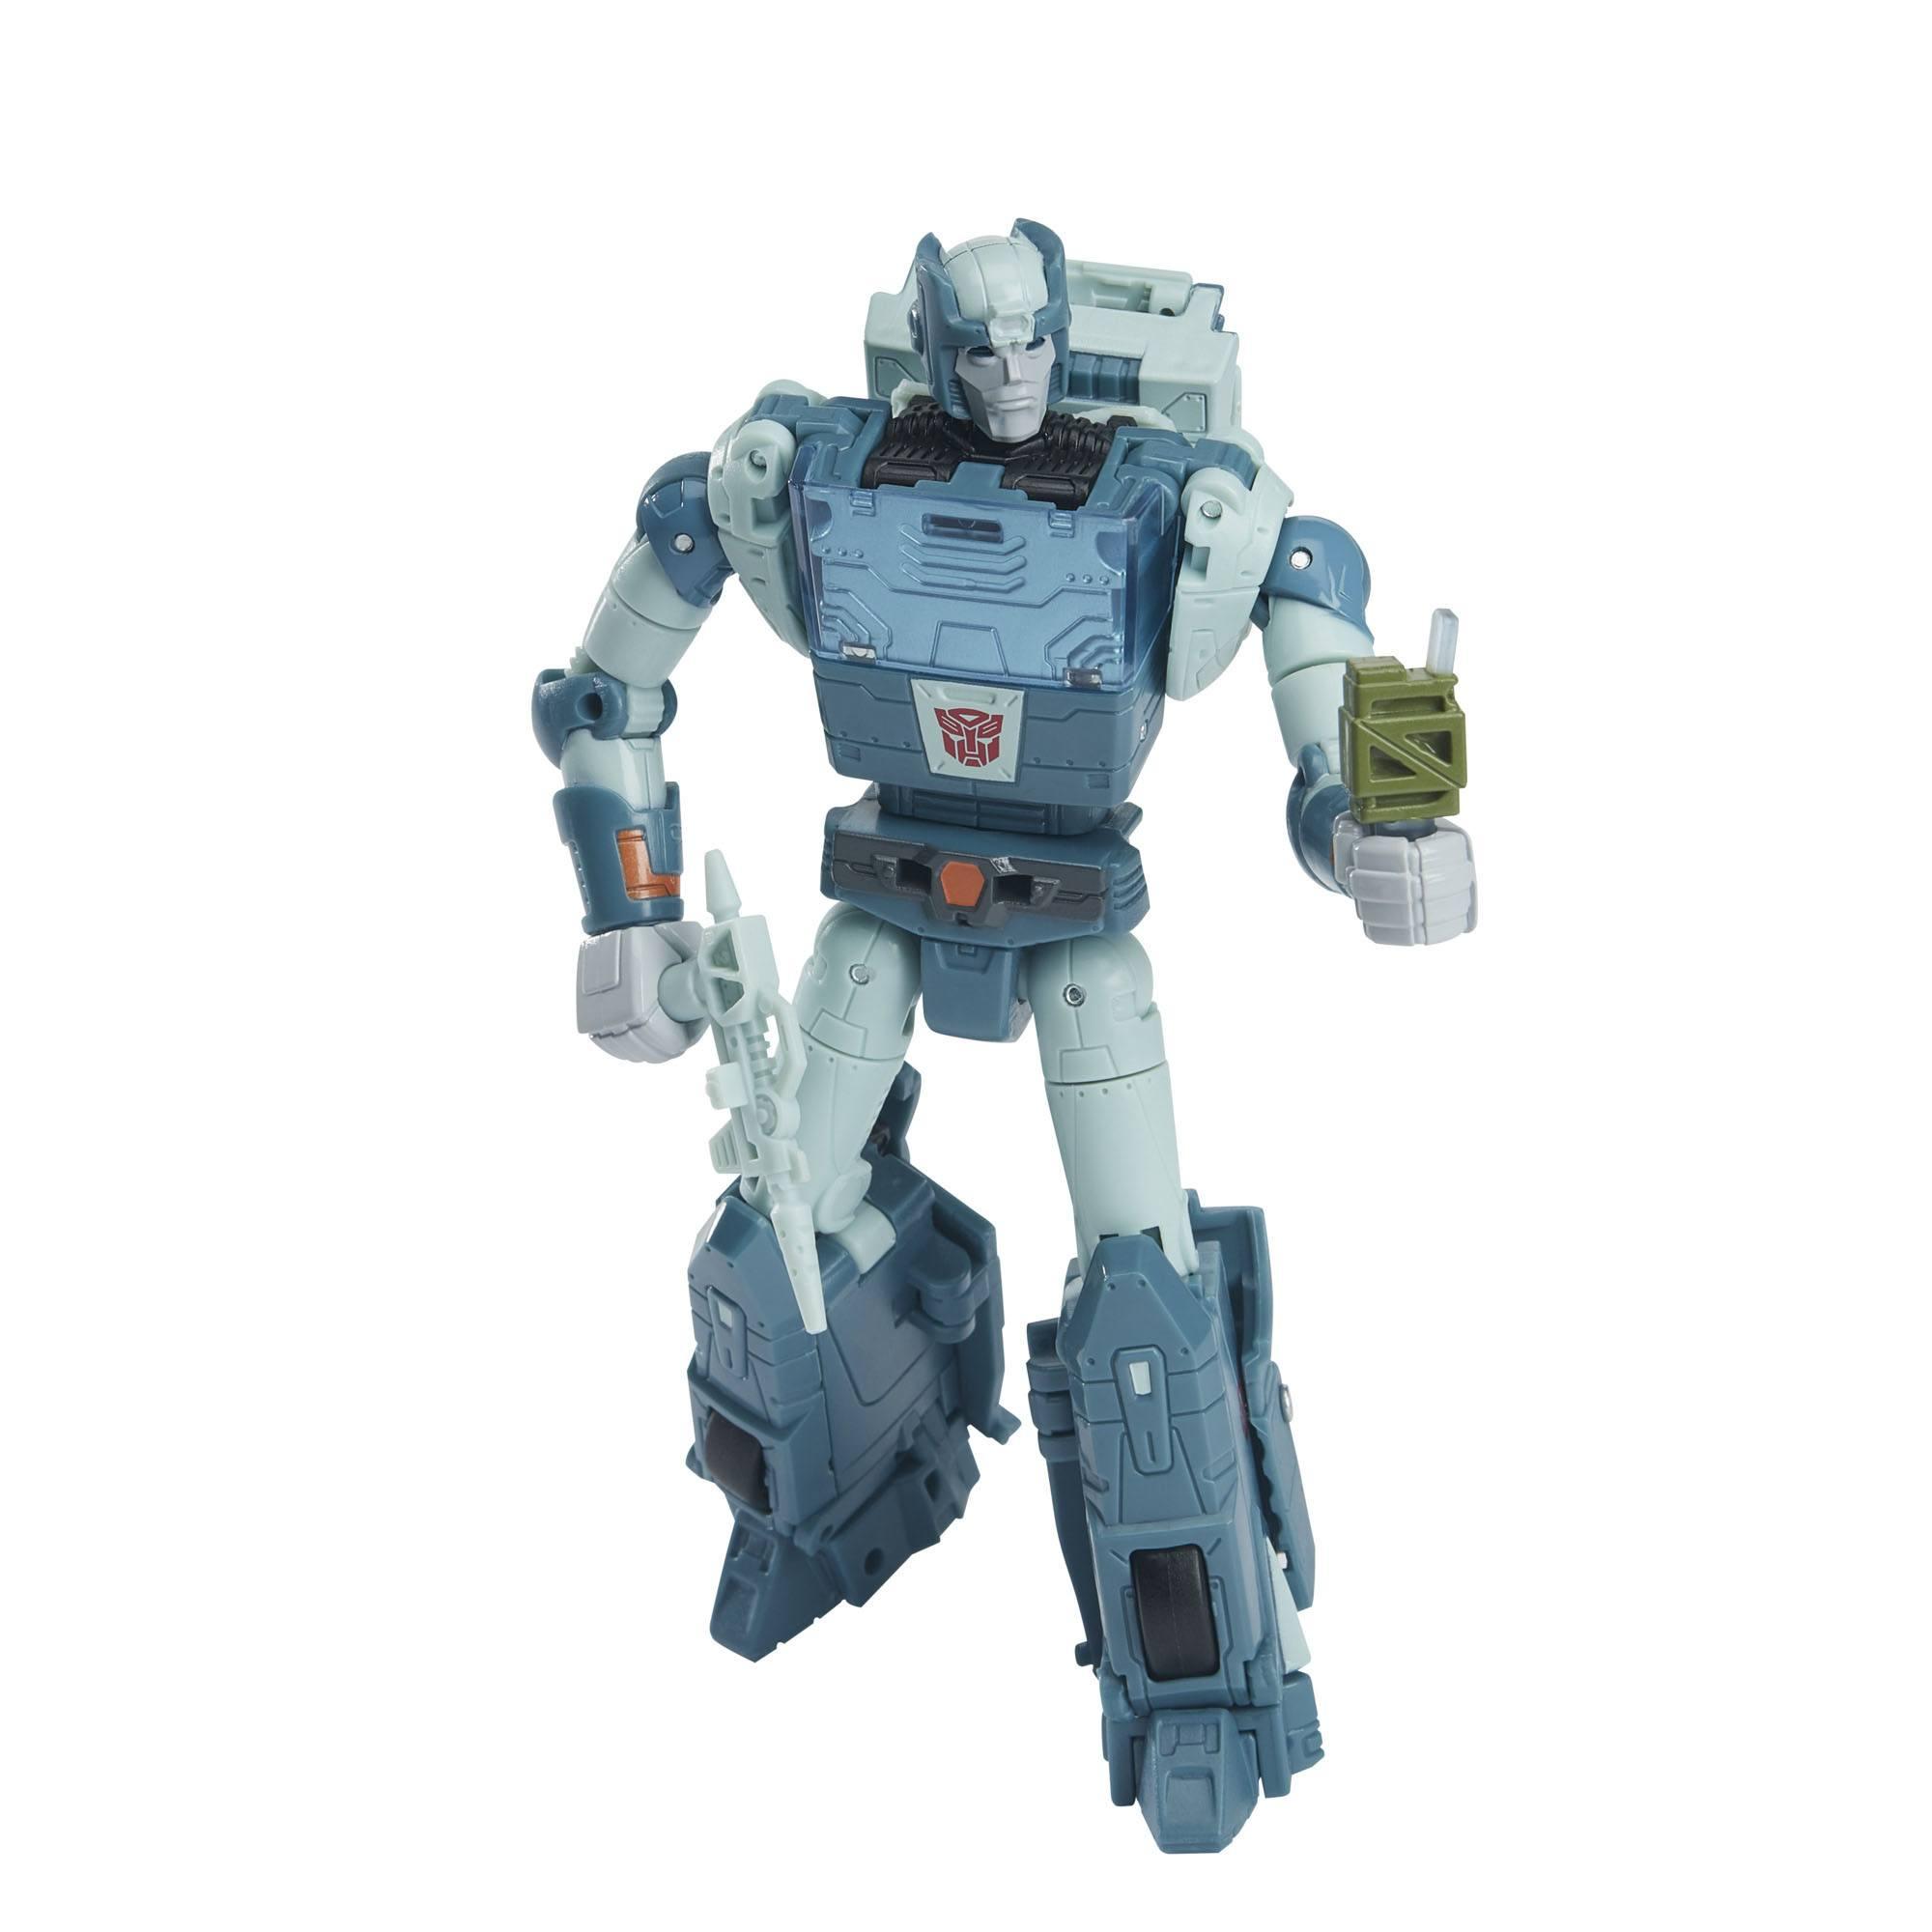 Transformers Studio Series Deluxe: KUP by Hasbro